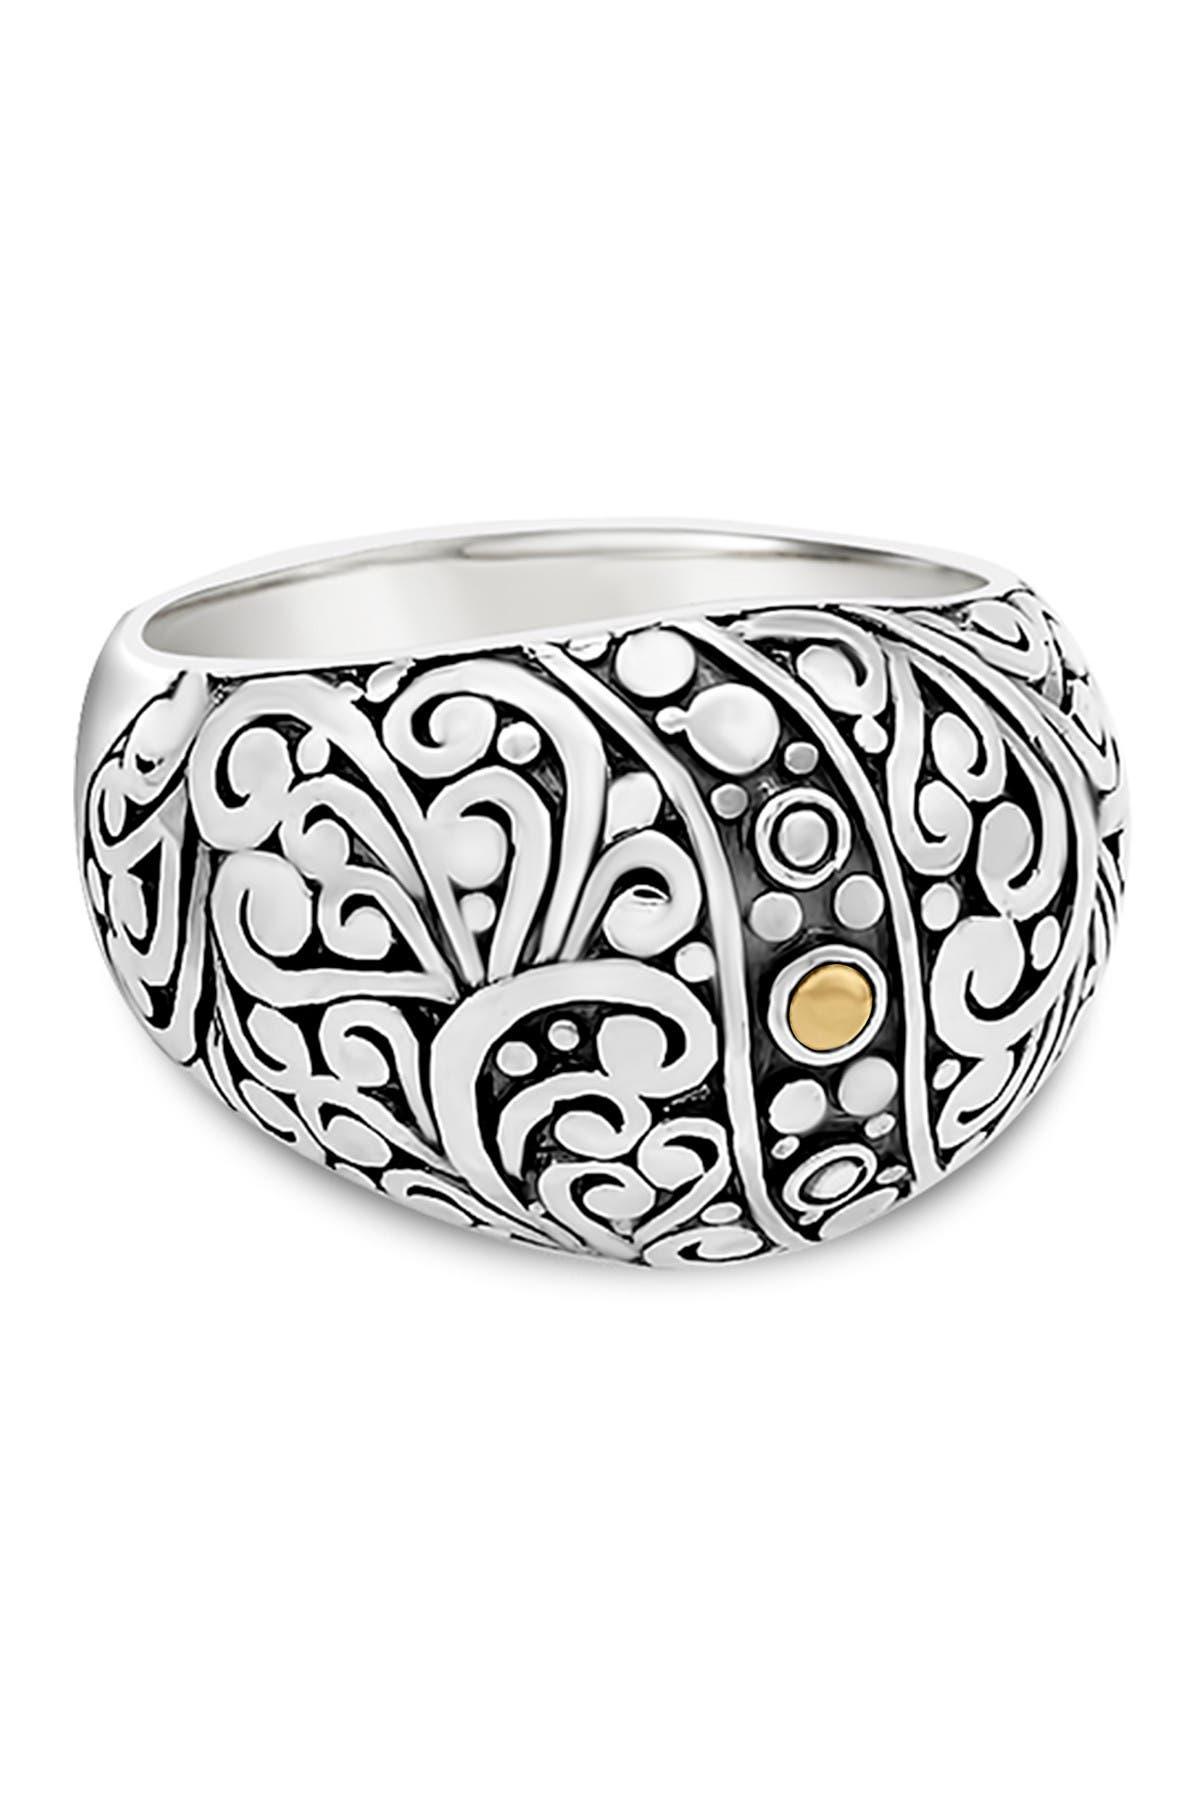 Image of DEVATA Sterling Silver Bali Filigree Dome Ring